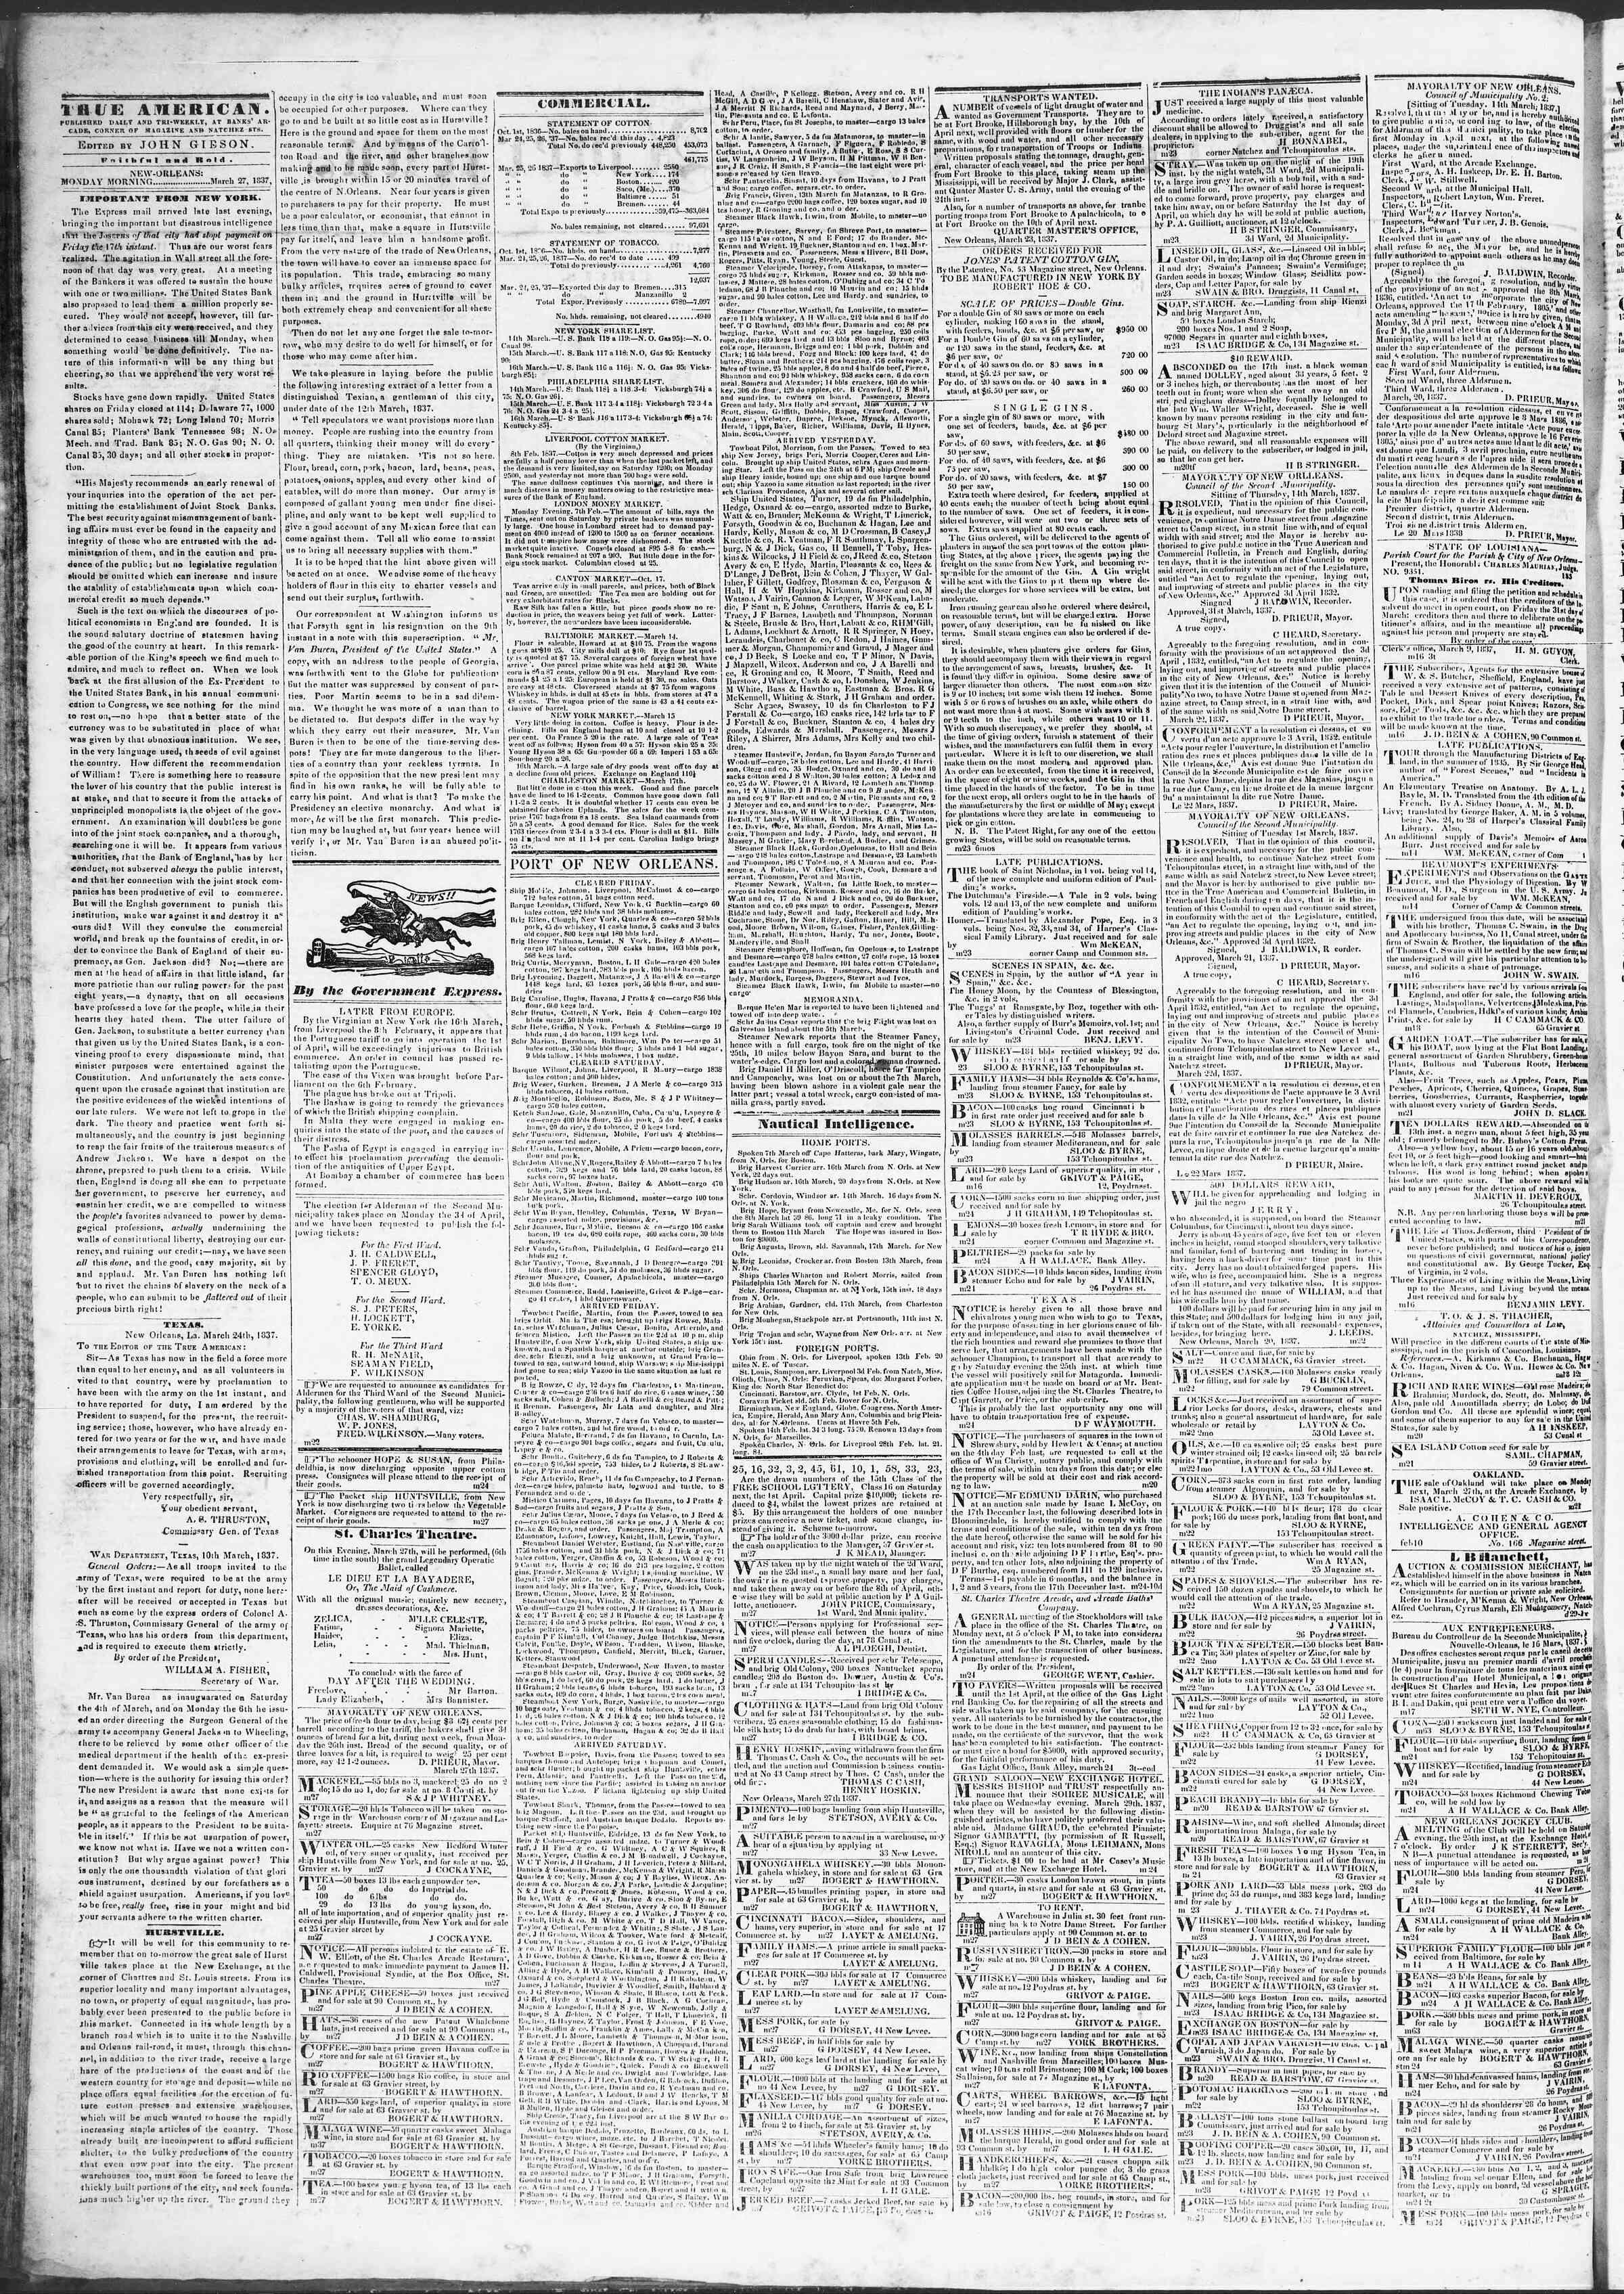 27 Mart 1837 Tarihli True American Gazetesi Sayfa 2